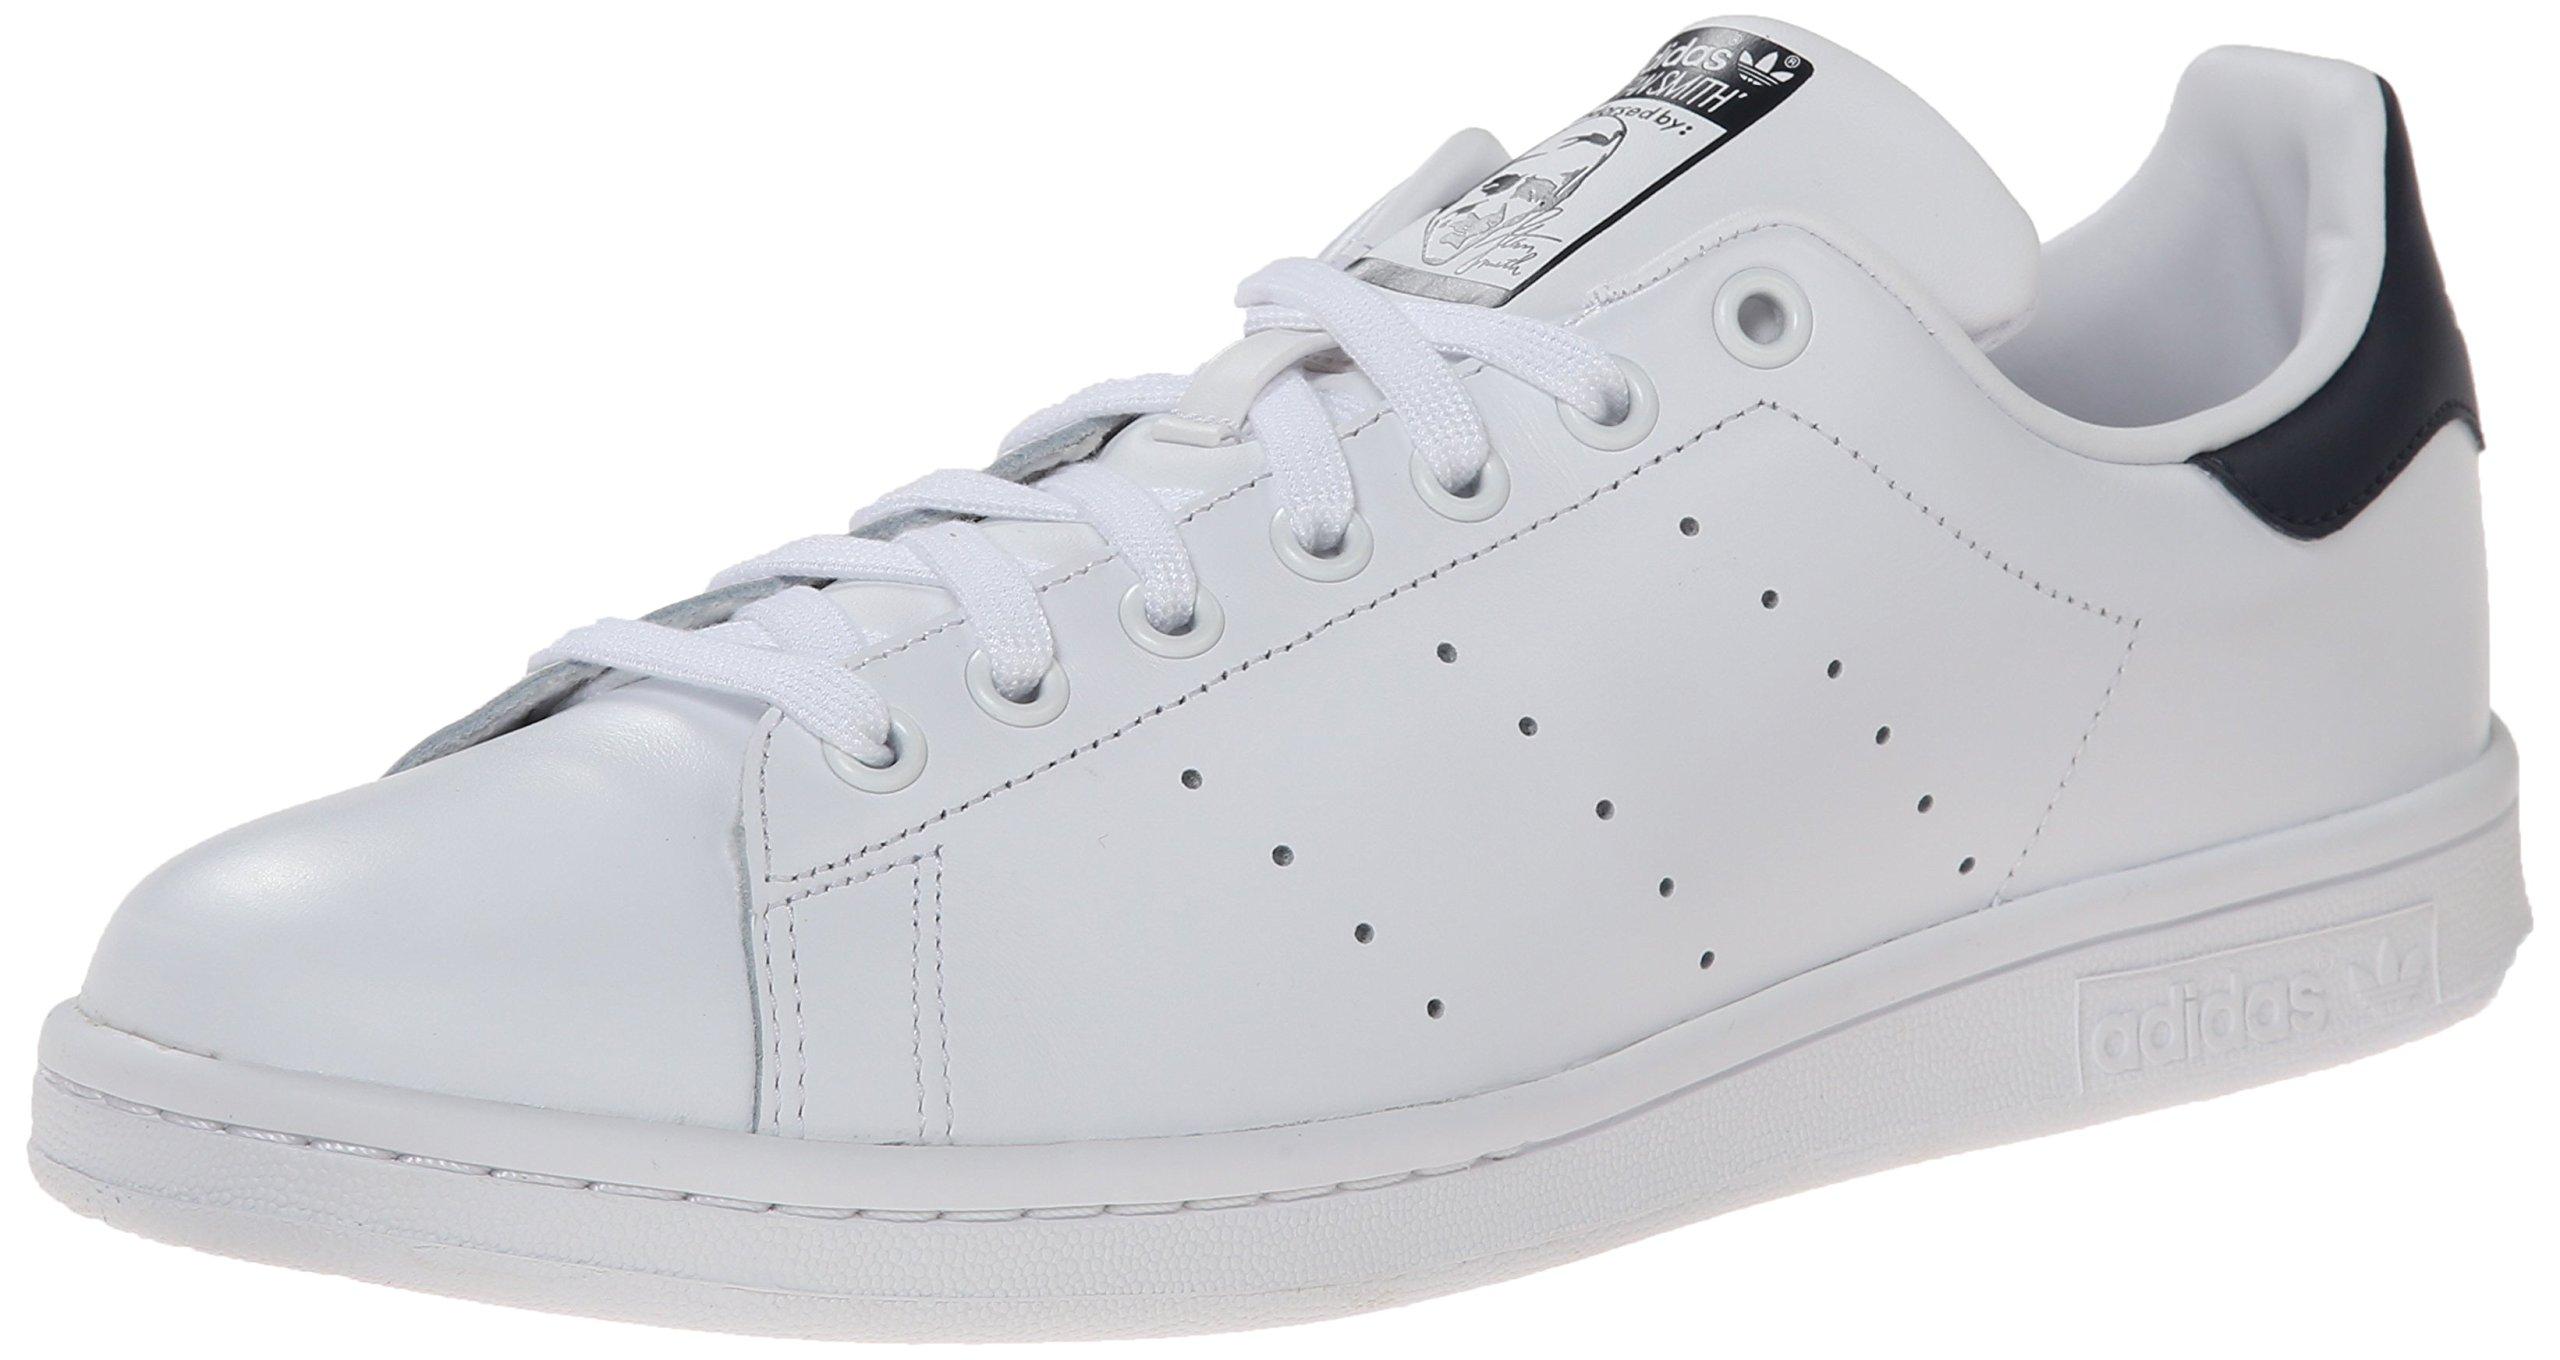 Adidas Men's Originals Stan Smith Sneaker, White/White/Dark Blue, 12 M US